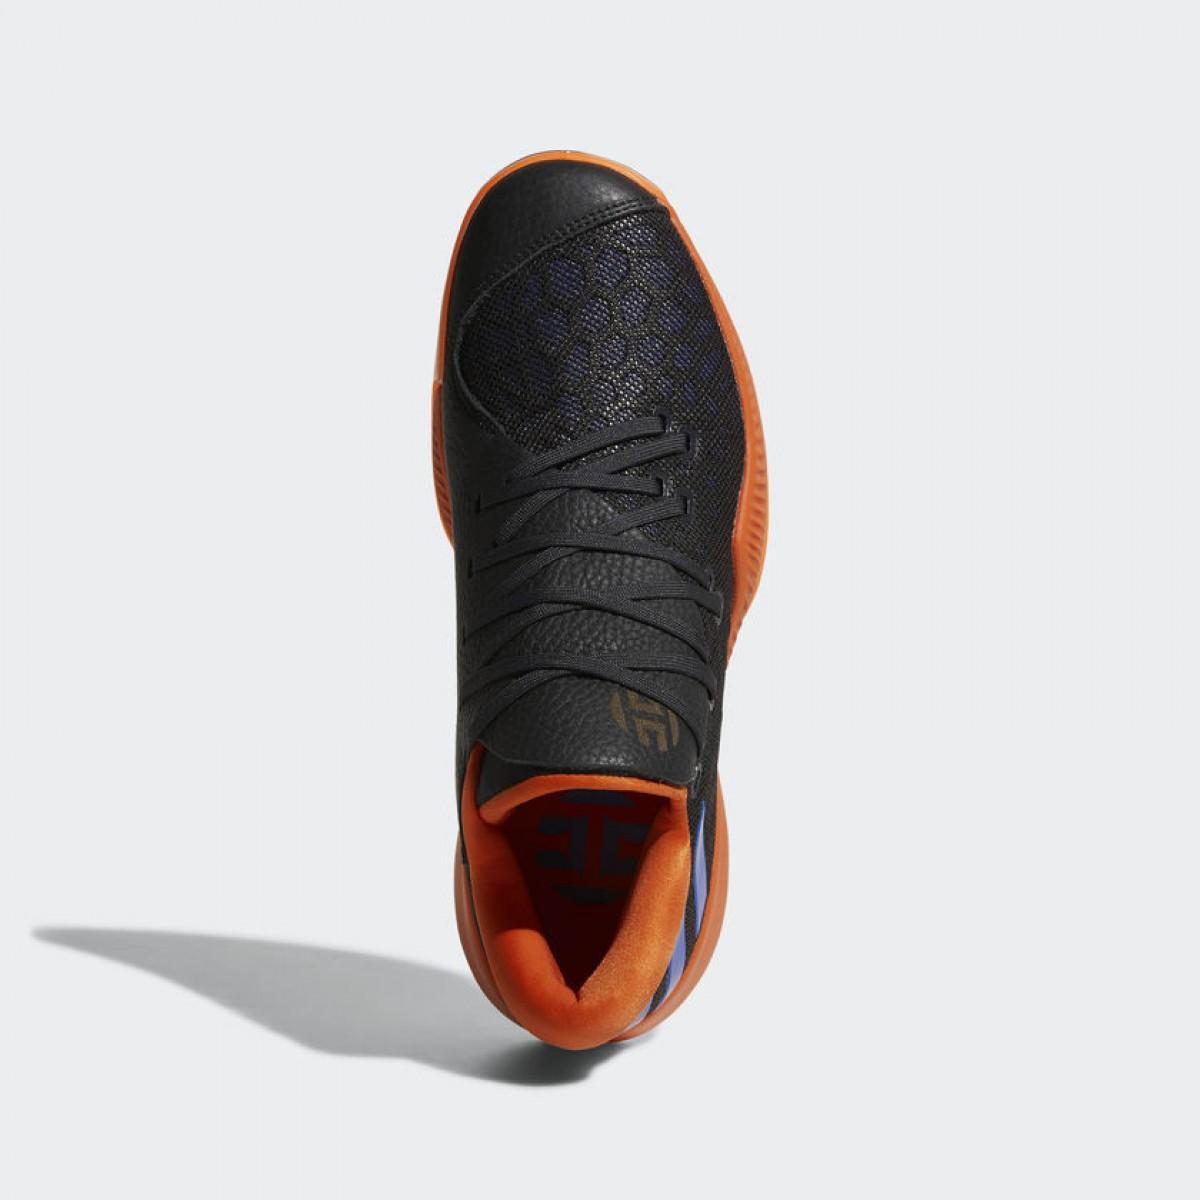 Adidas Harden B/E 'Suns Away' AC7865